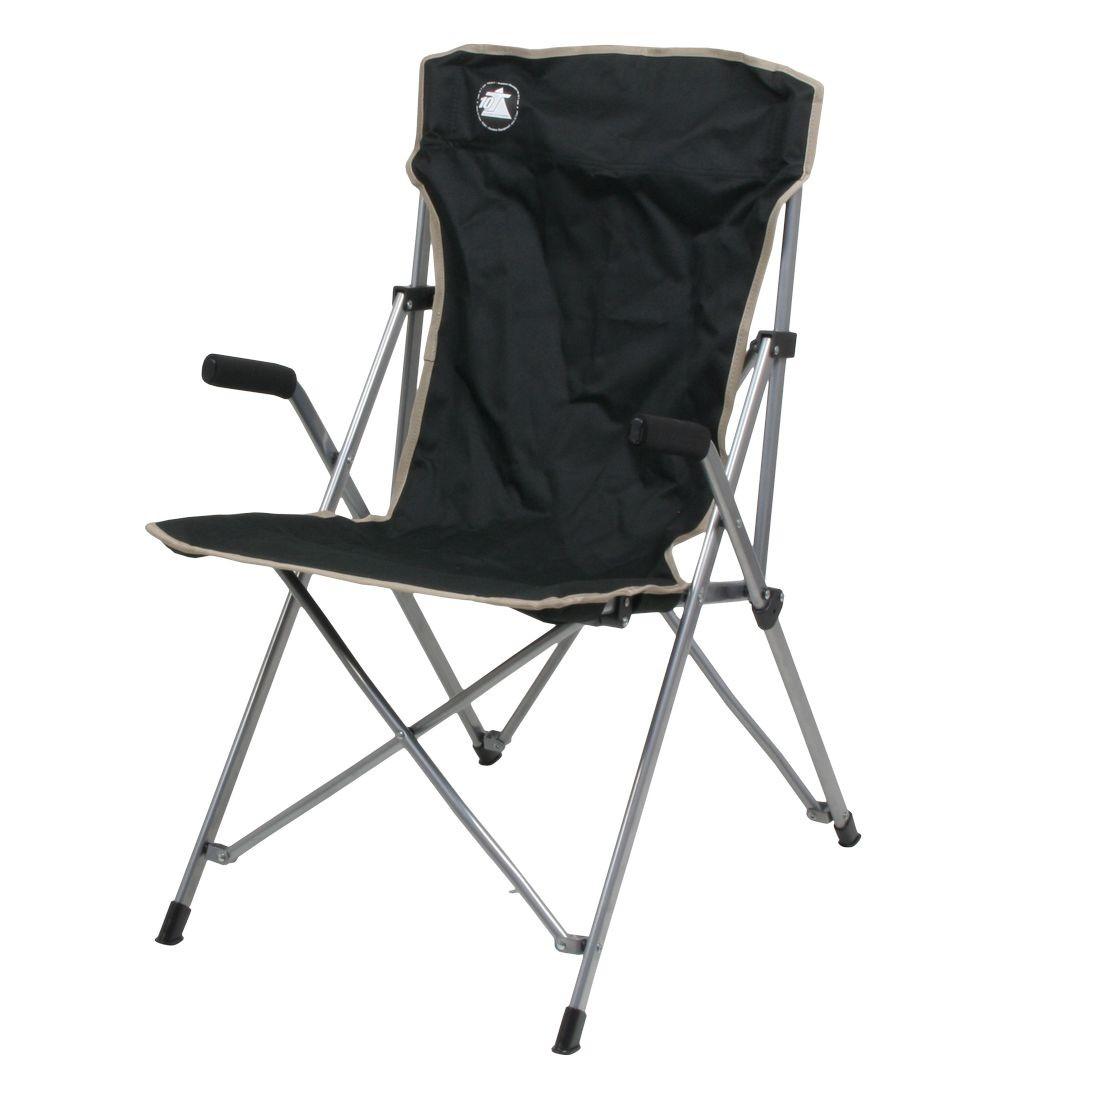 Comprar 10t slimboy silla de camping plegable con - Silla camping plegable ...